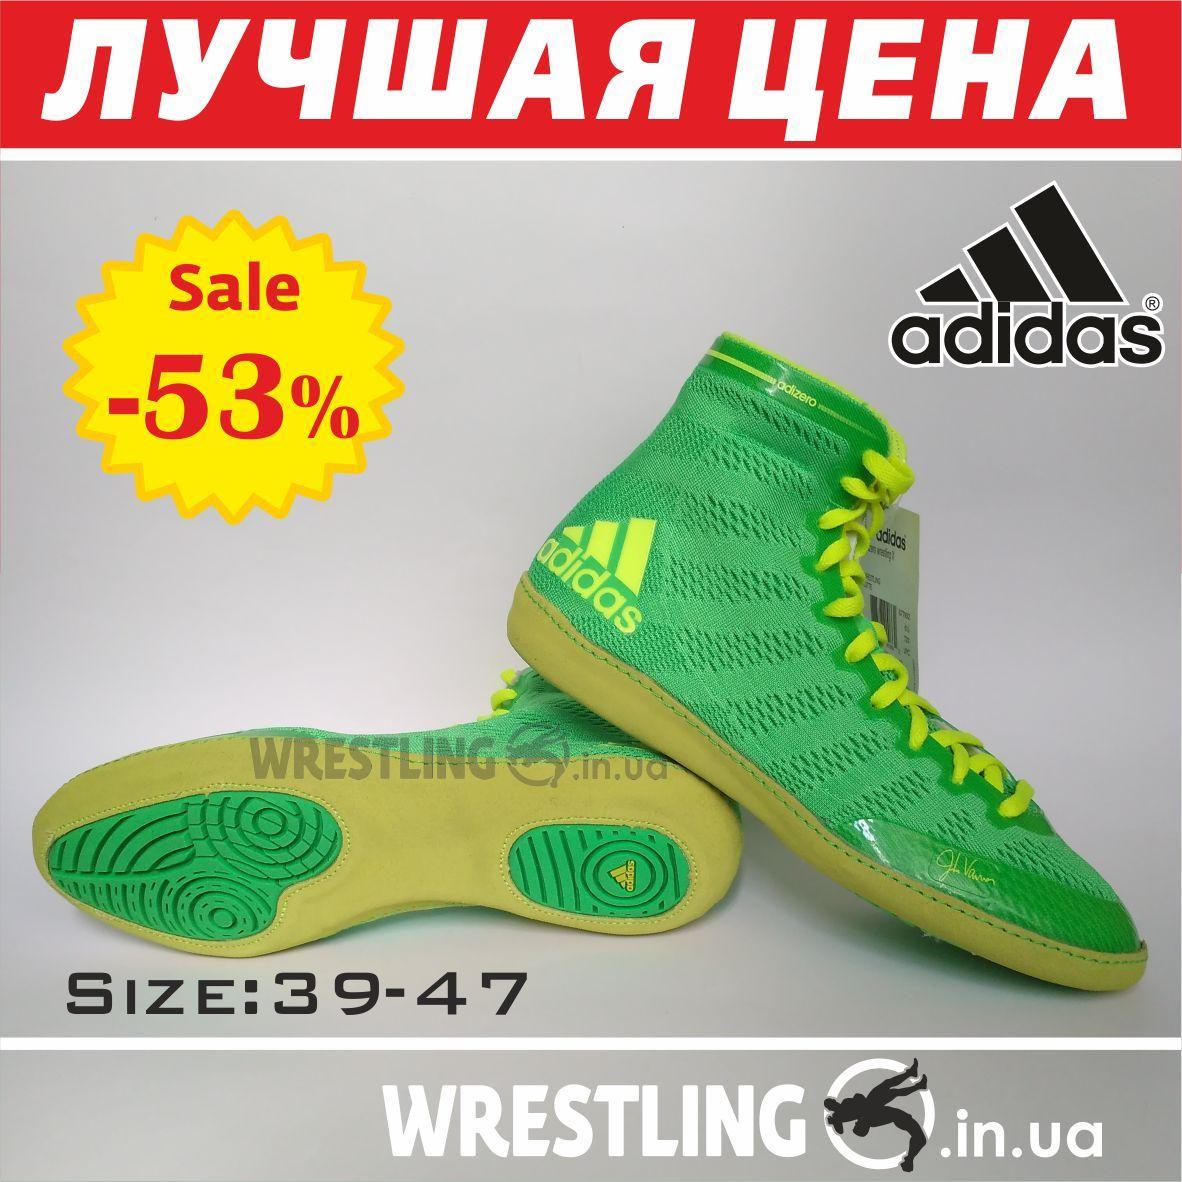 dec50d86a4b9d9 Борцовки боксерки Adidas adiZero Varner wrestling shoes - wrestling.in.ua -  борцовское трико